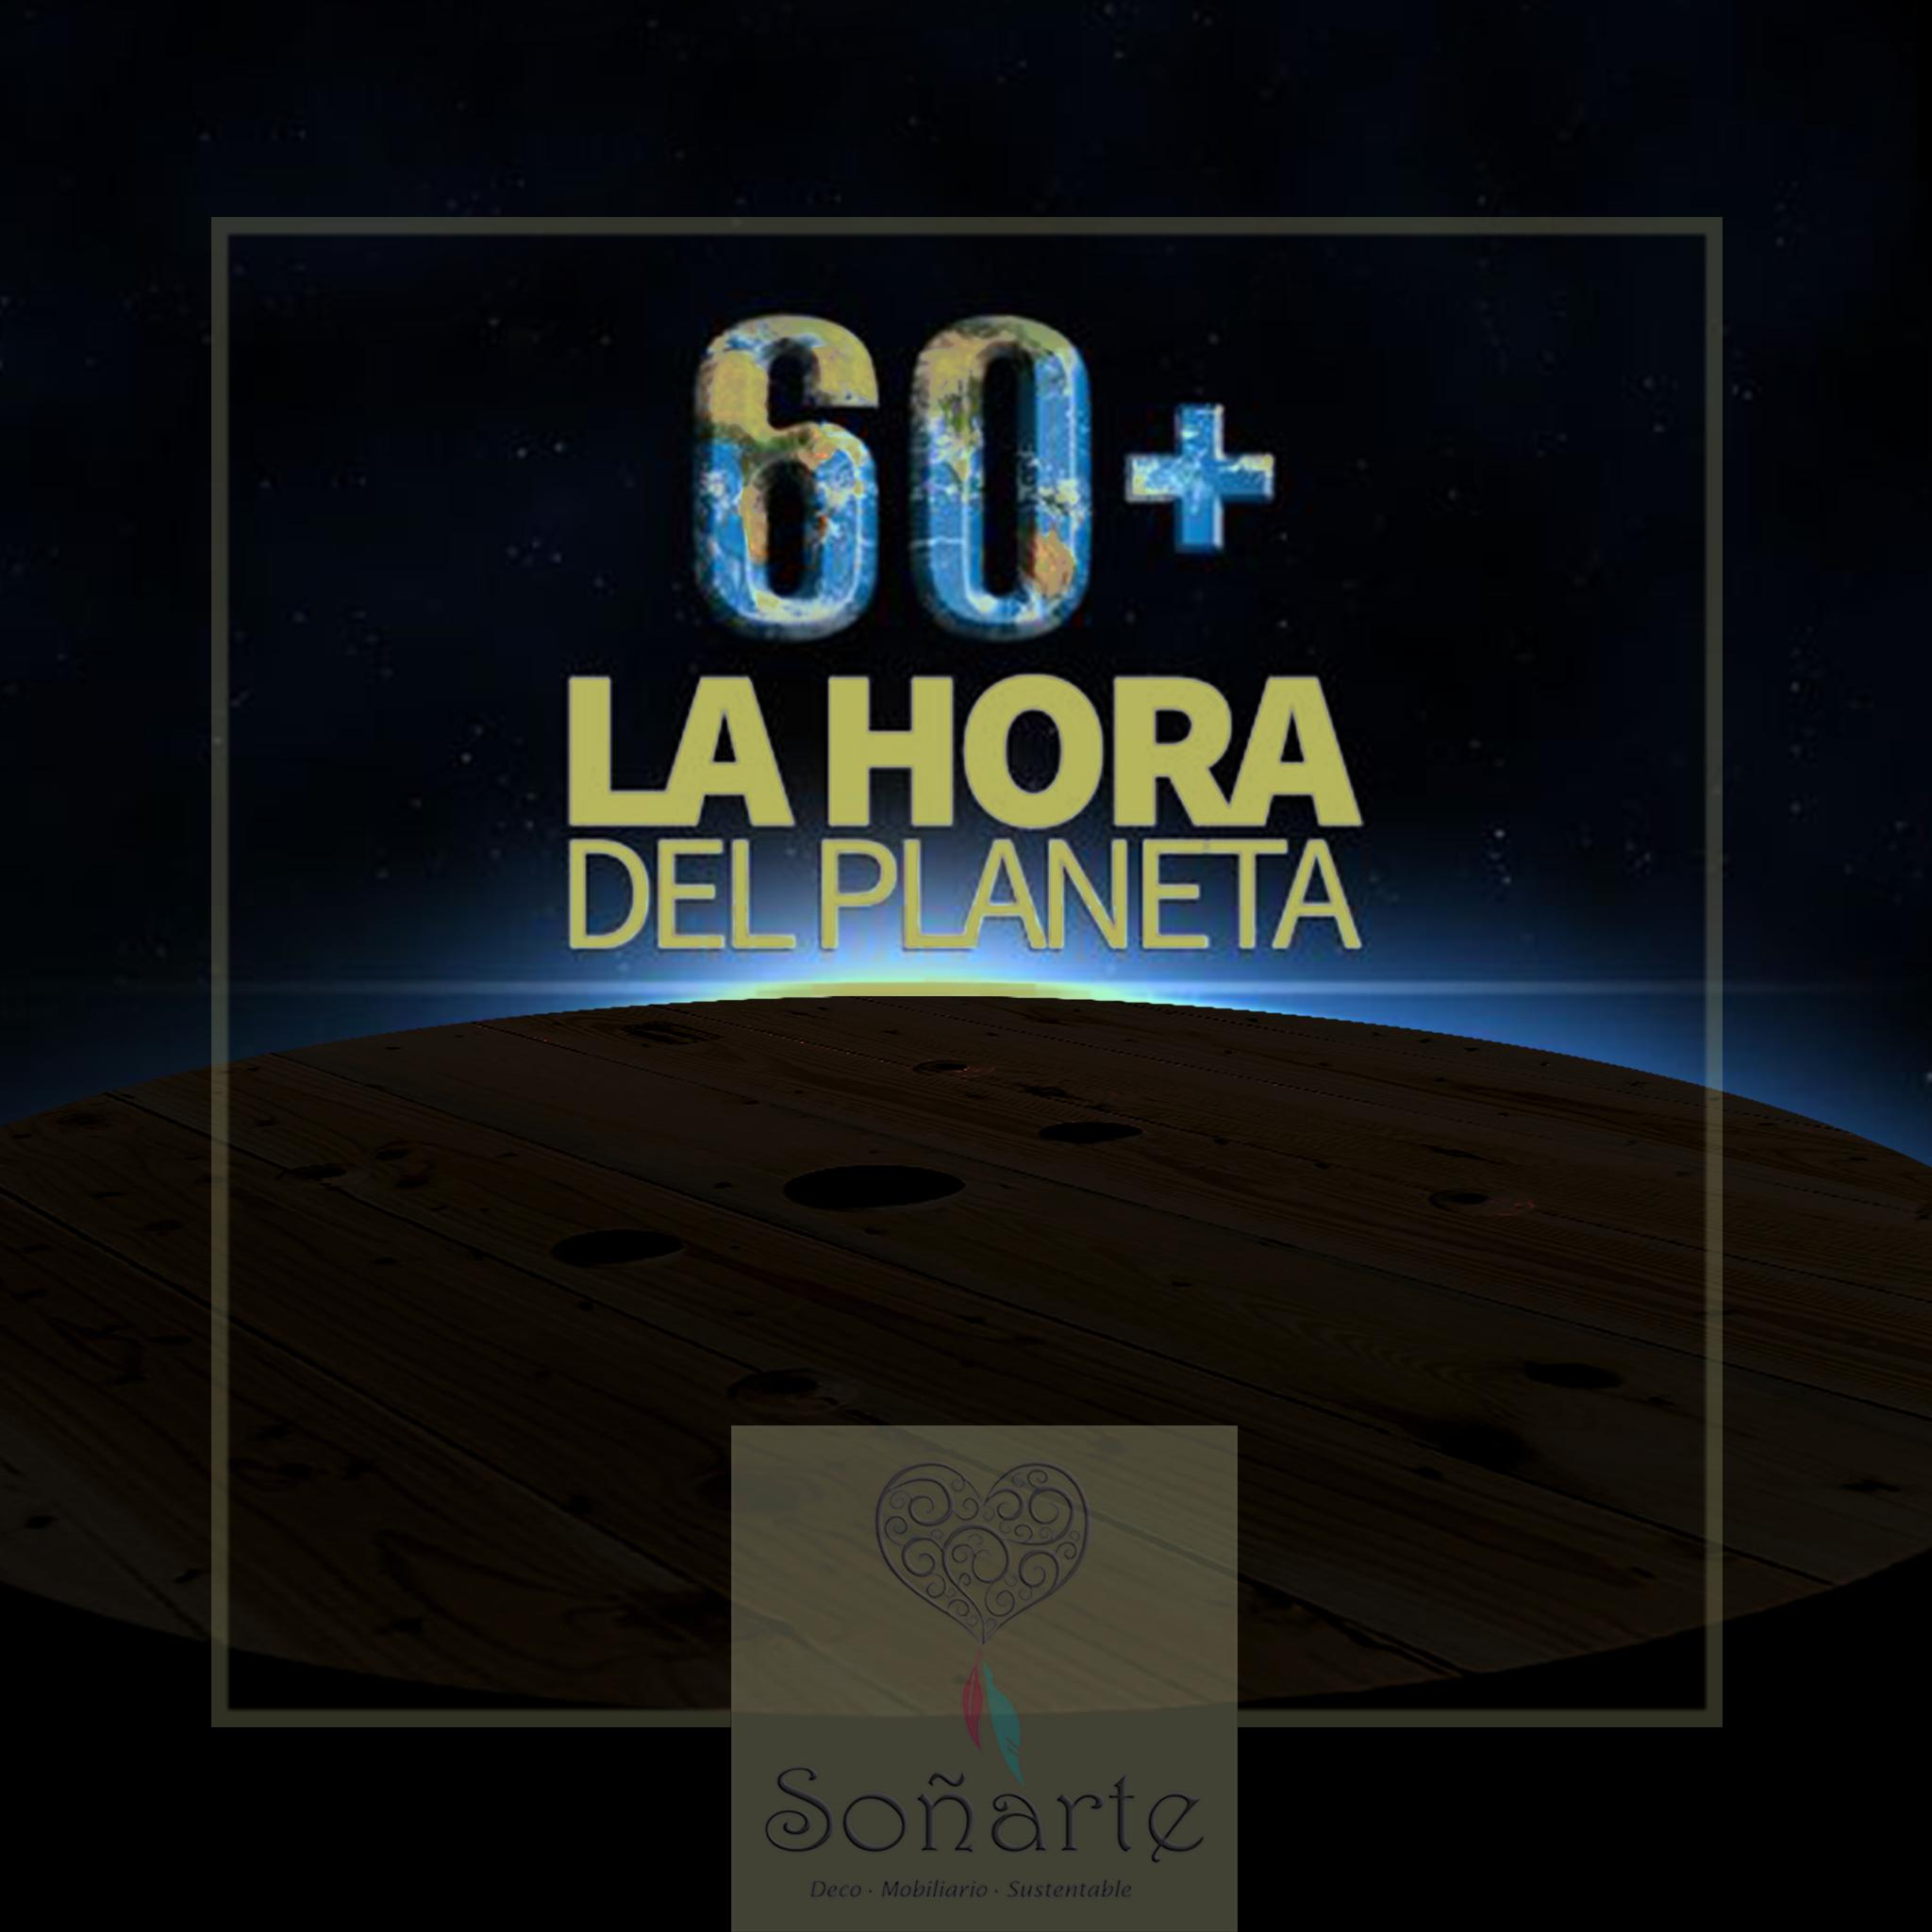 Revierte tu karma, apaga la luz.                      19 Marzo 2016 · 20:30 hrs. www.horadelplaneta.org/cl www.sonarte.cl